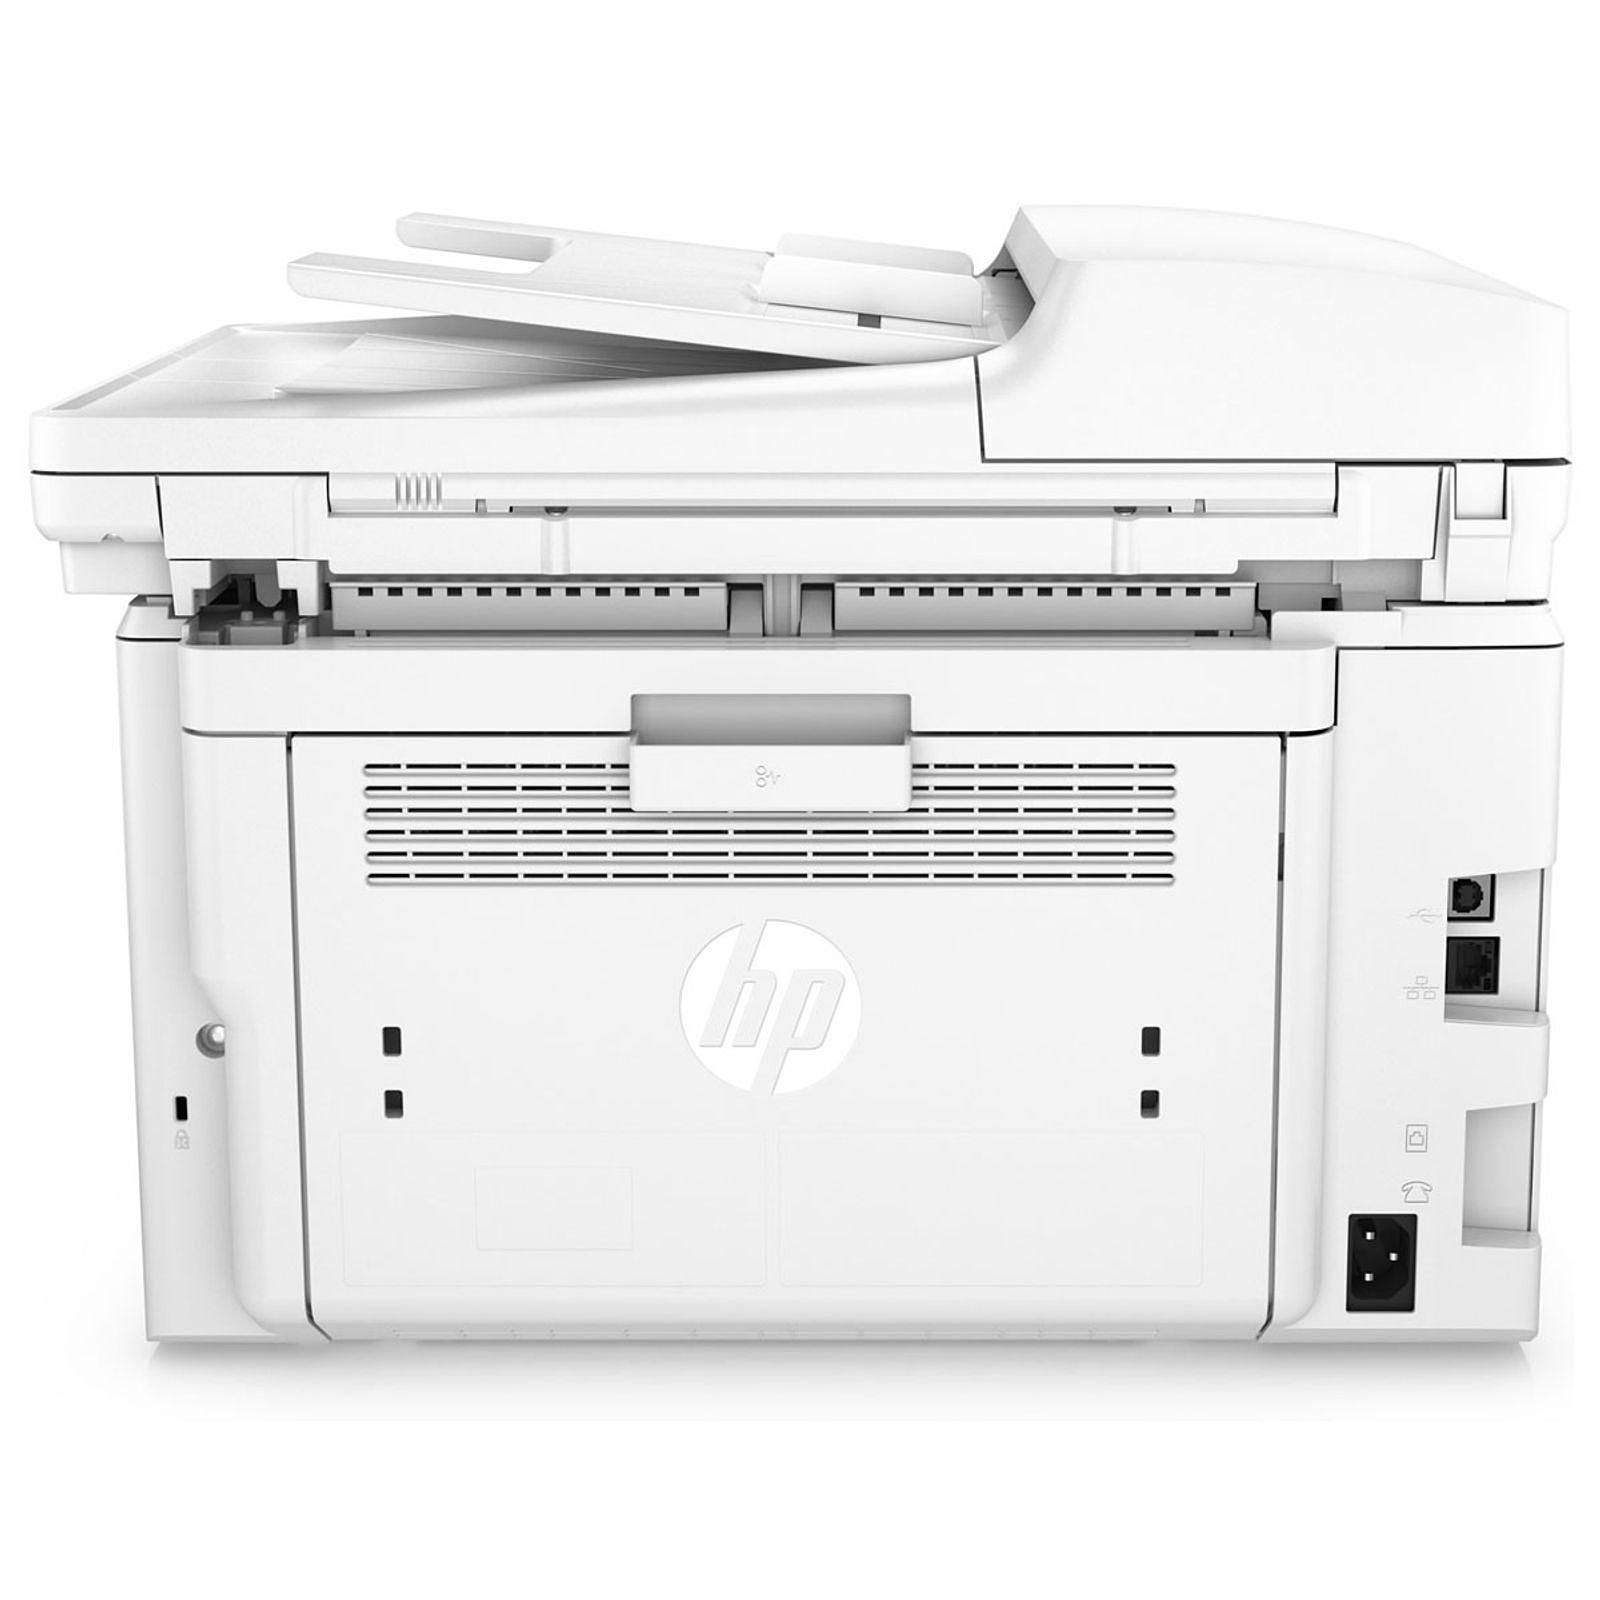 Imprimante multifonction HP LaserJet Pro MFP M227sdn - Cybertek.fr - 1